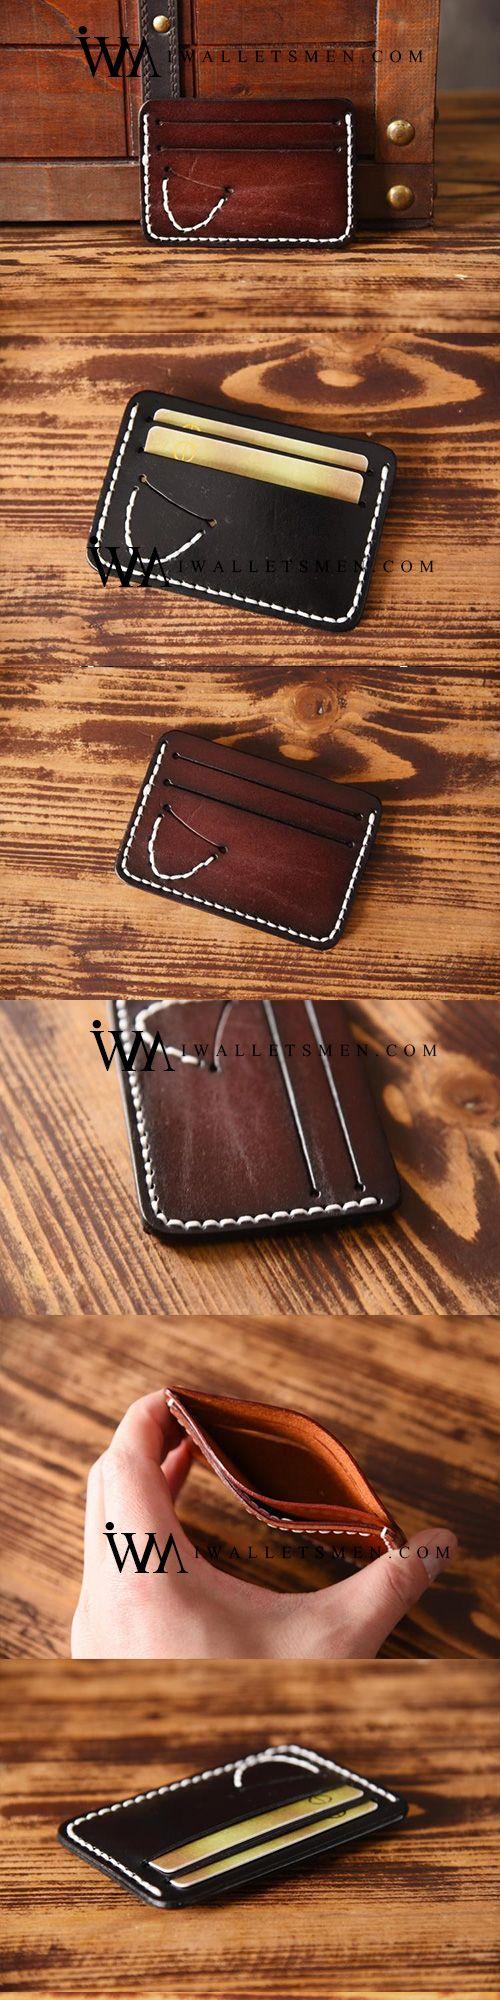 Handmade Mens Cool Short Leather Wallet Men Small Card Slim Wallets